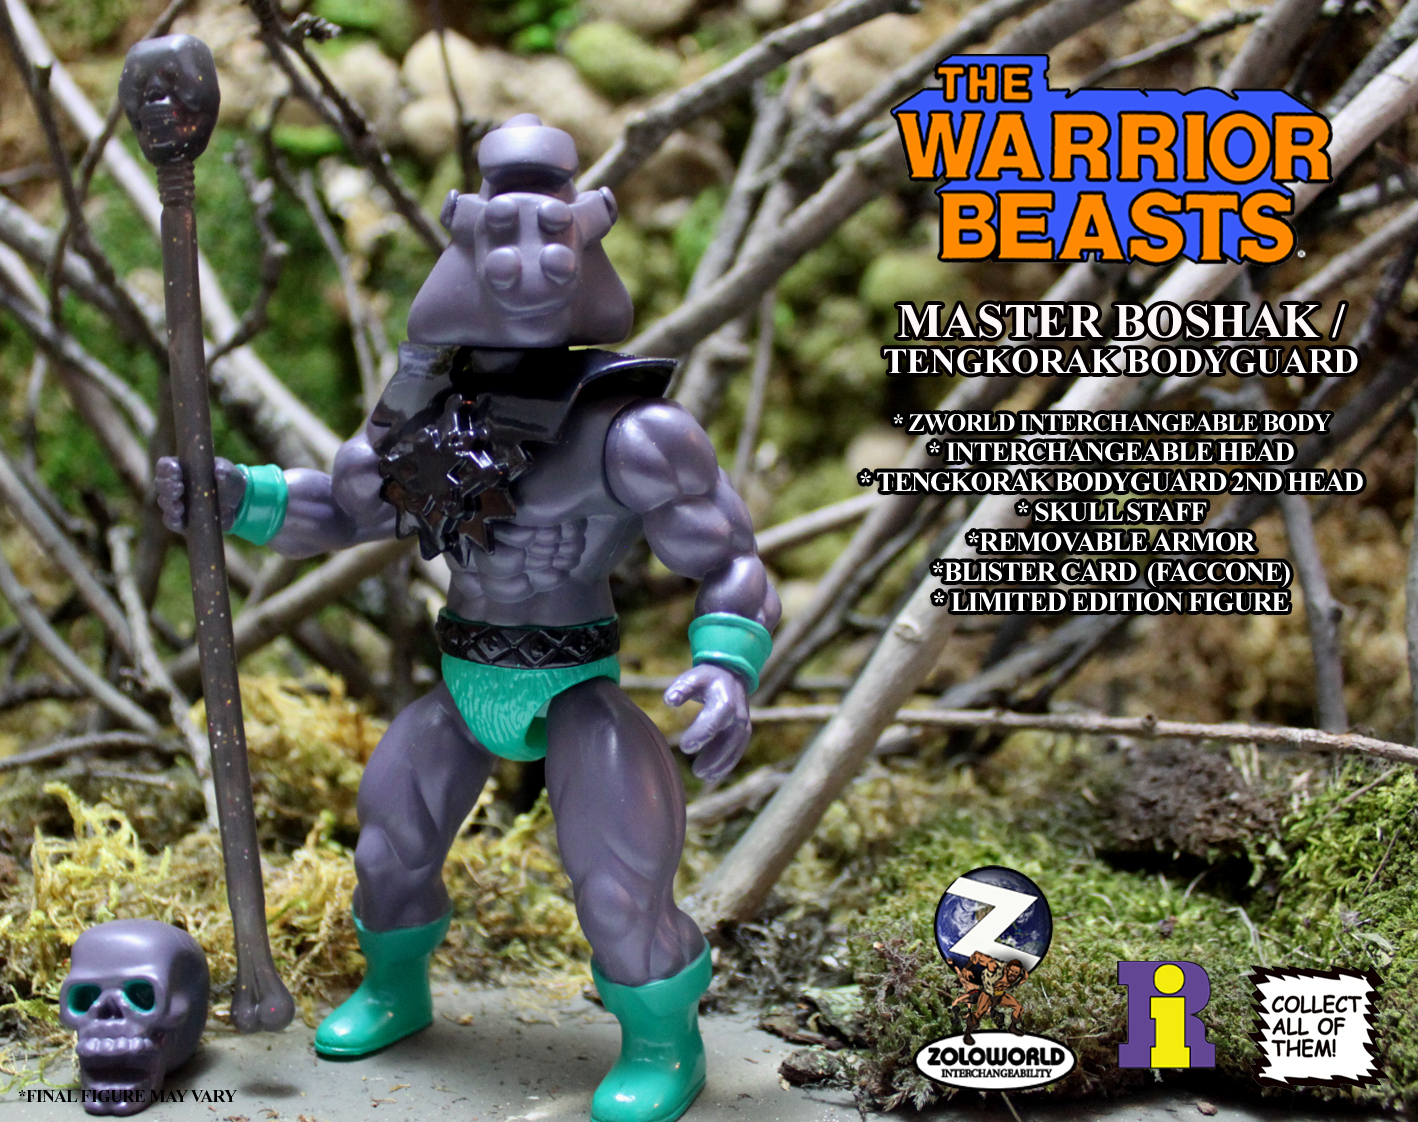 The Warrior Beasts: MASTER BOSHAK / TENGKORAK BODYGUARD by Zoloworld